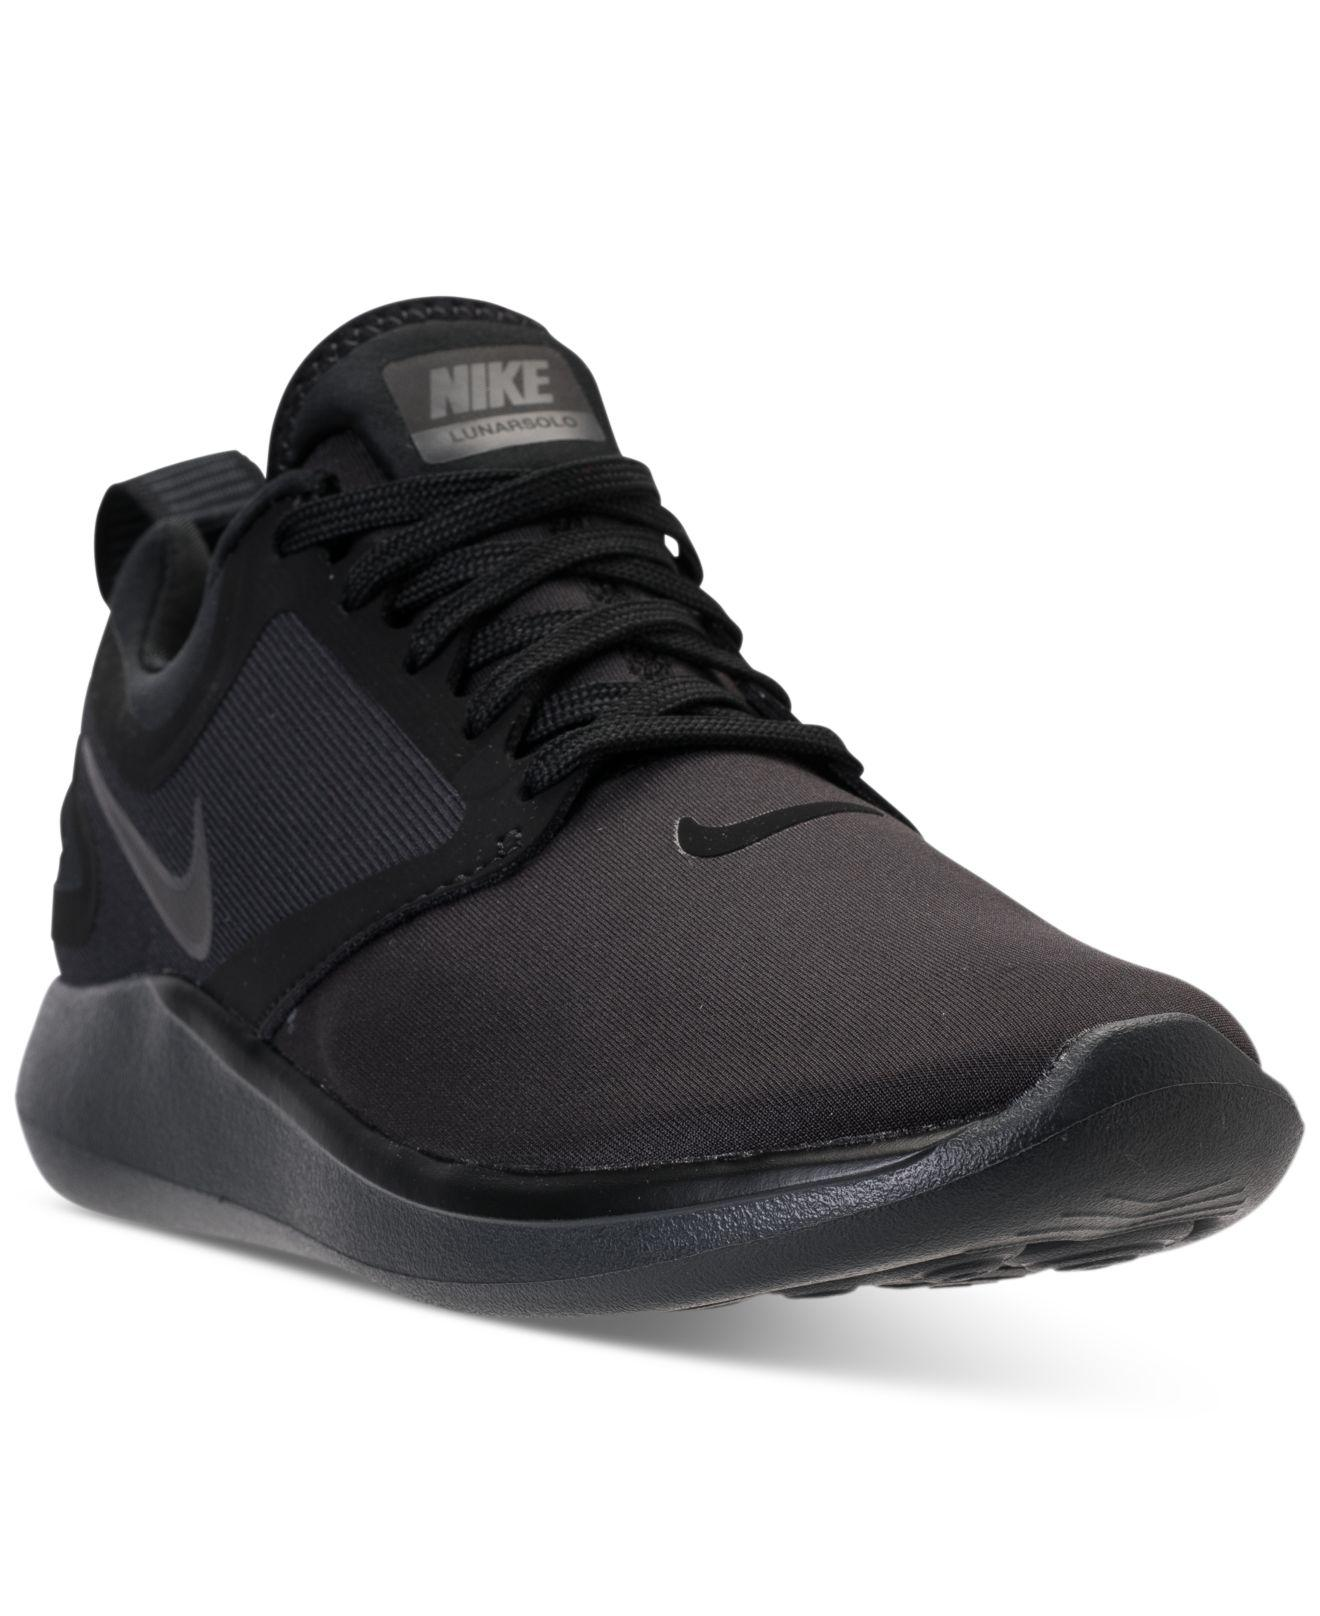 Nike - Black Women's Lunarsolo Running Sneakers From Finish Line - Lyst.  View Fullscreen